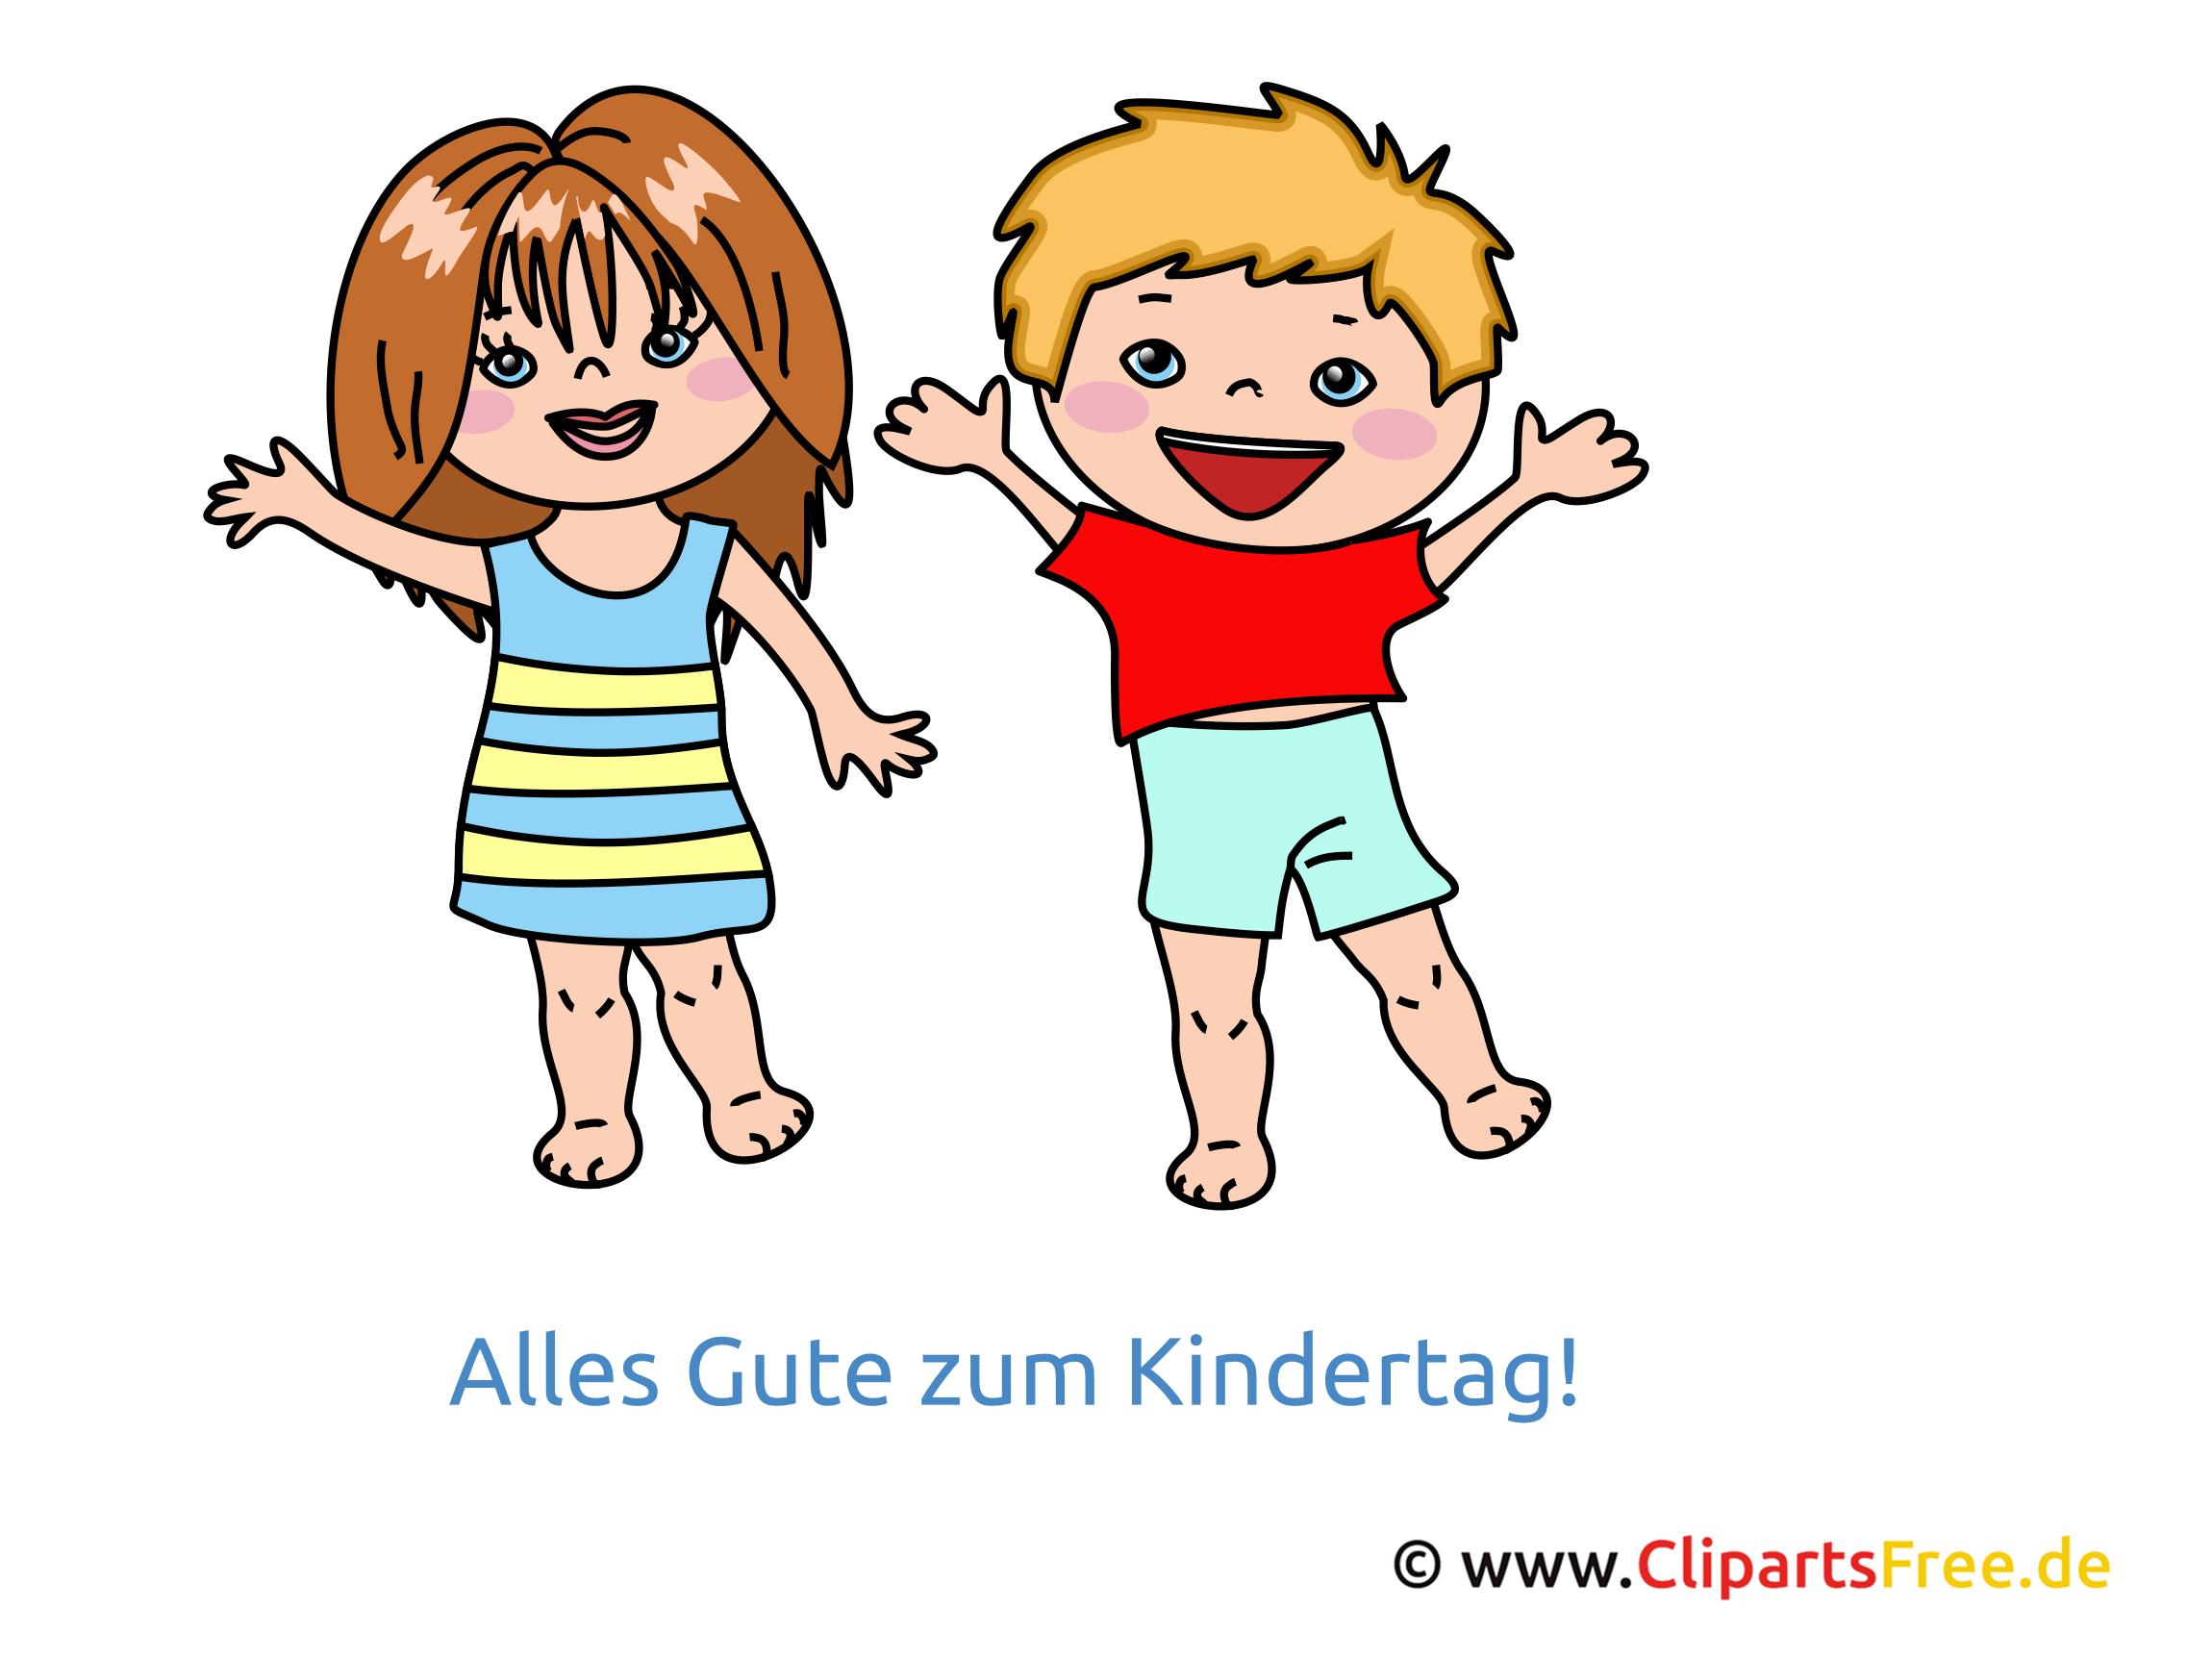 clipart kostenlos kindertag - photo #1